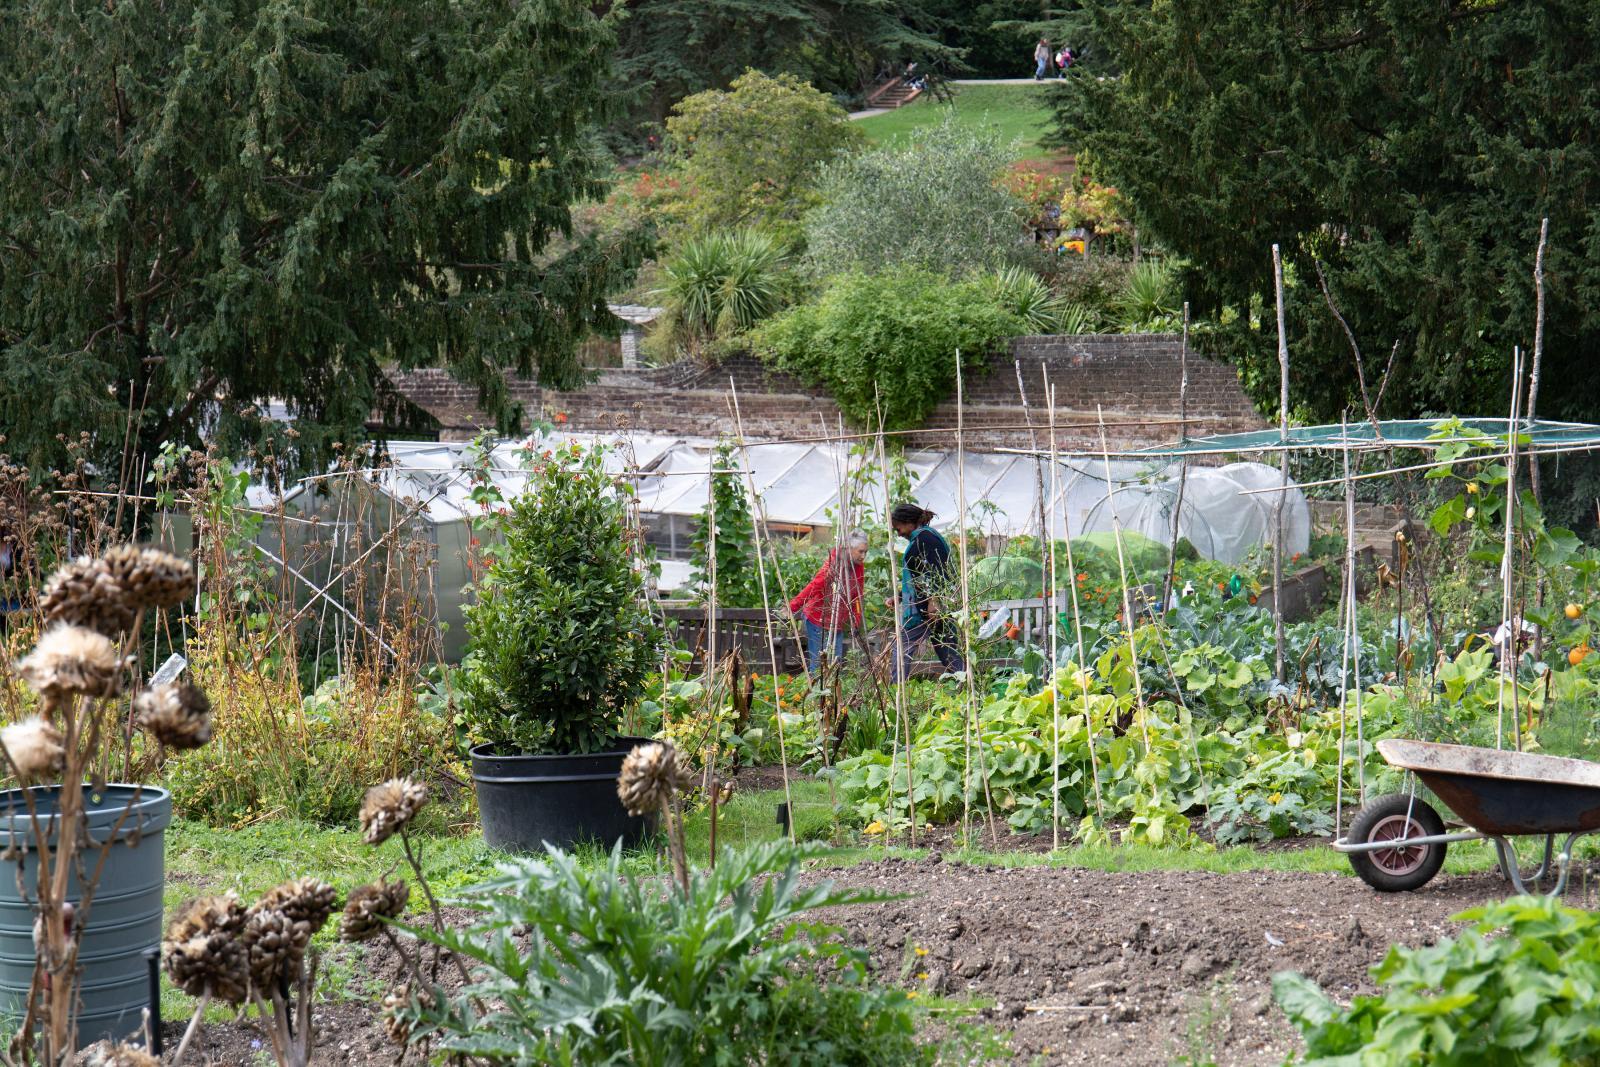 Streatham Community Garden. Photo credit: Zoe Warde-Aldam